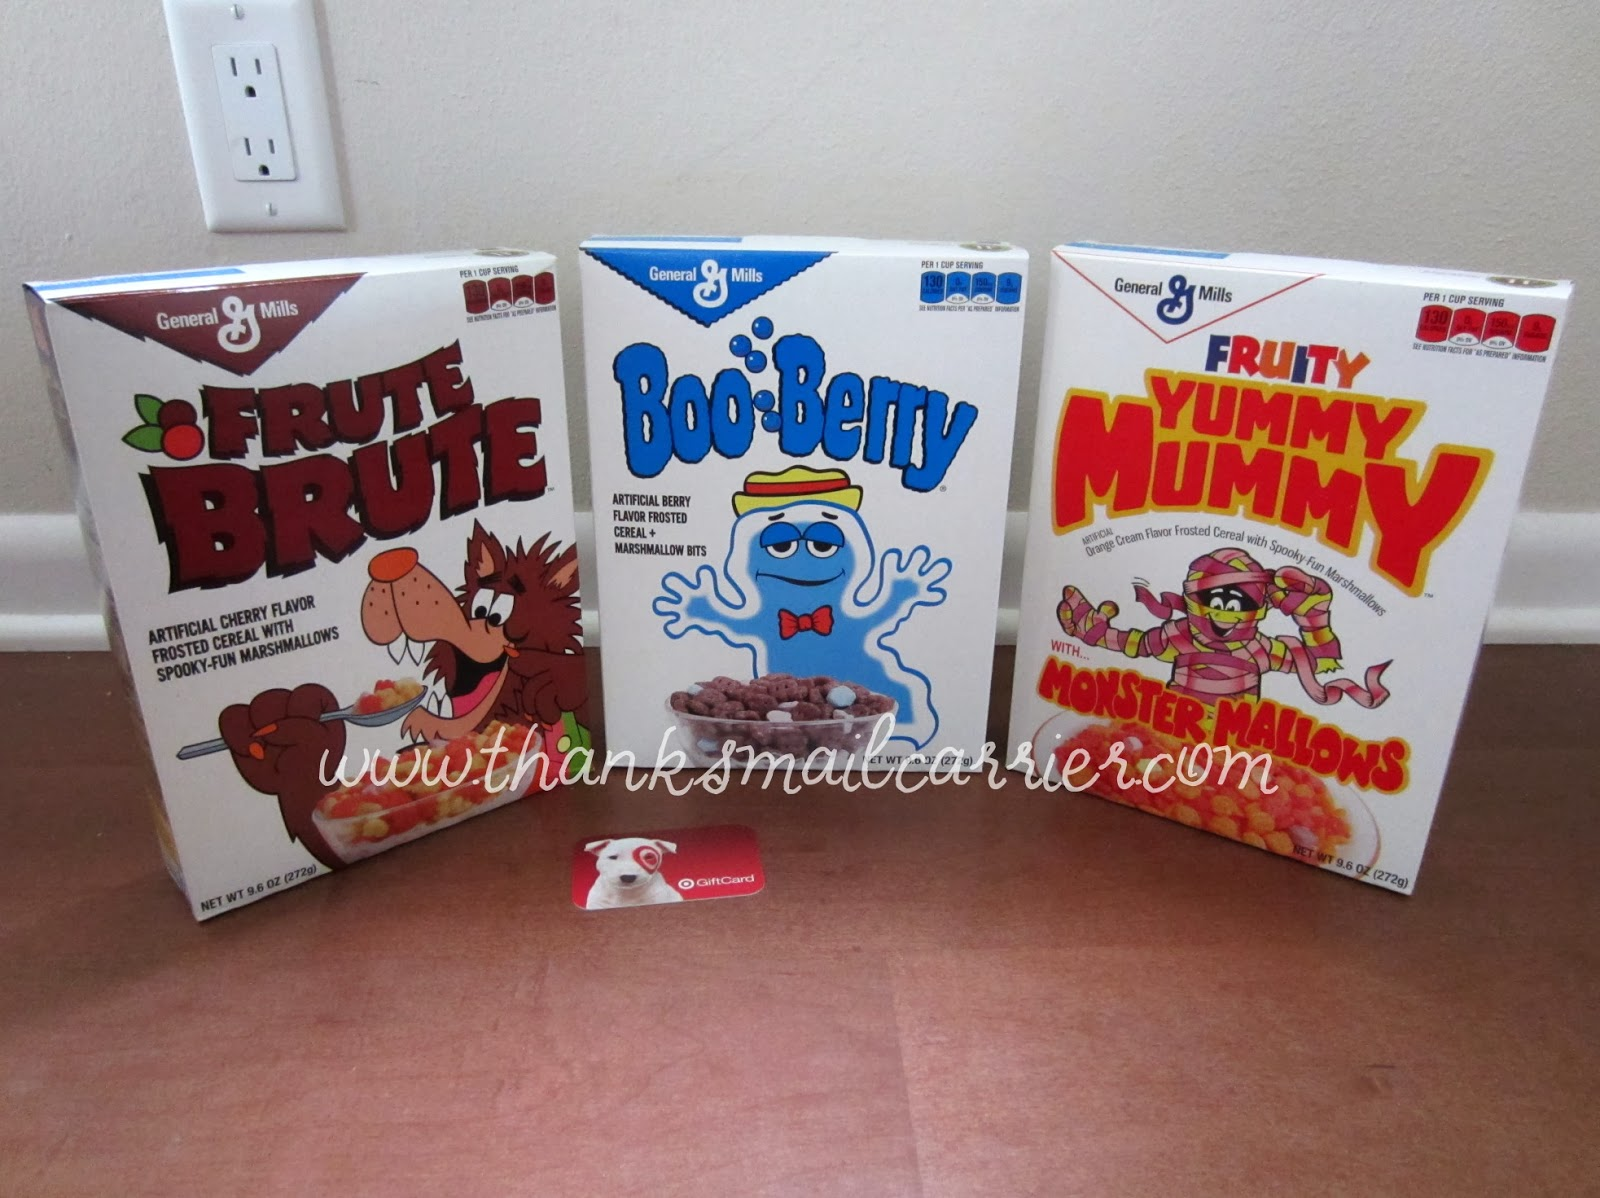 General Mills retro cereals